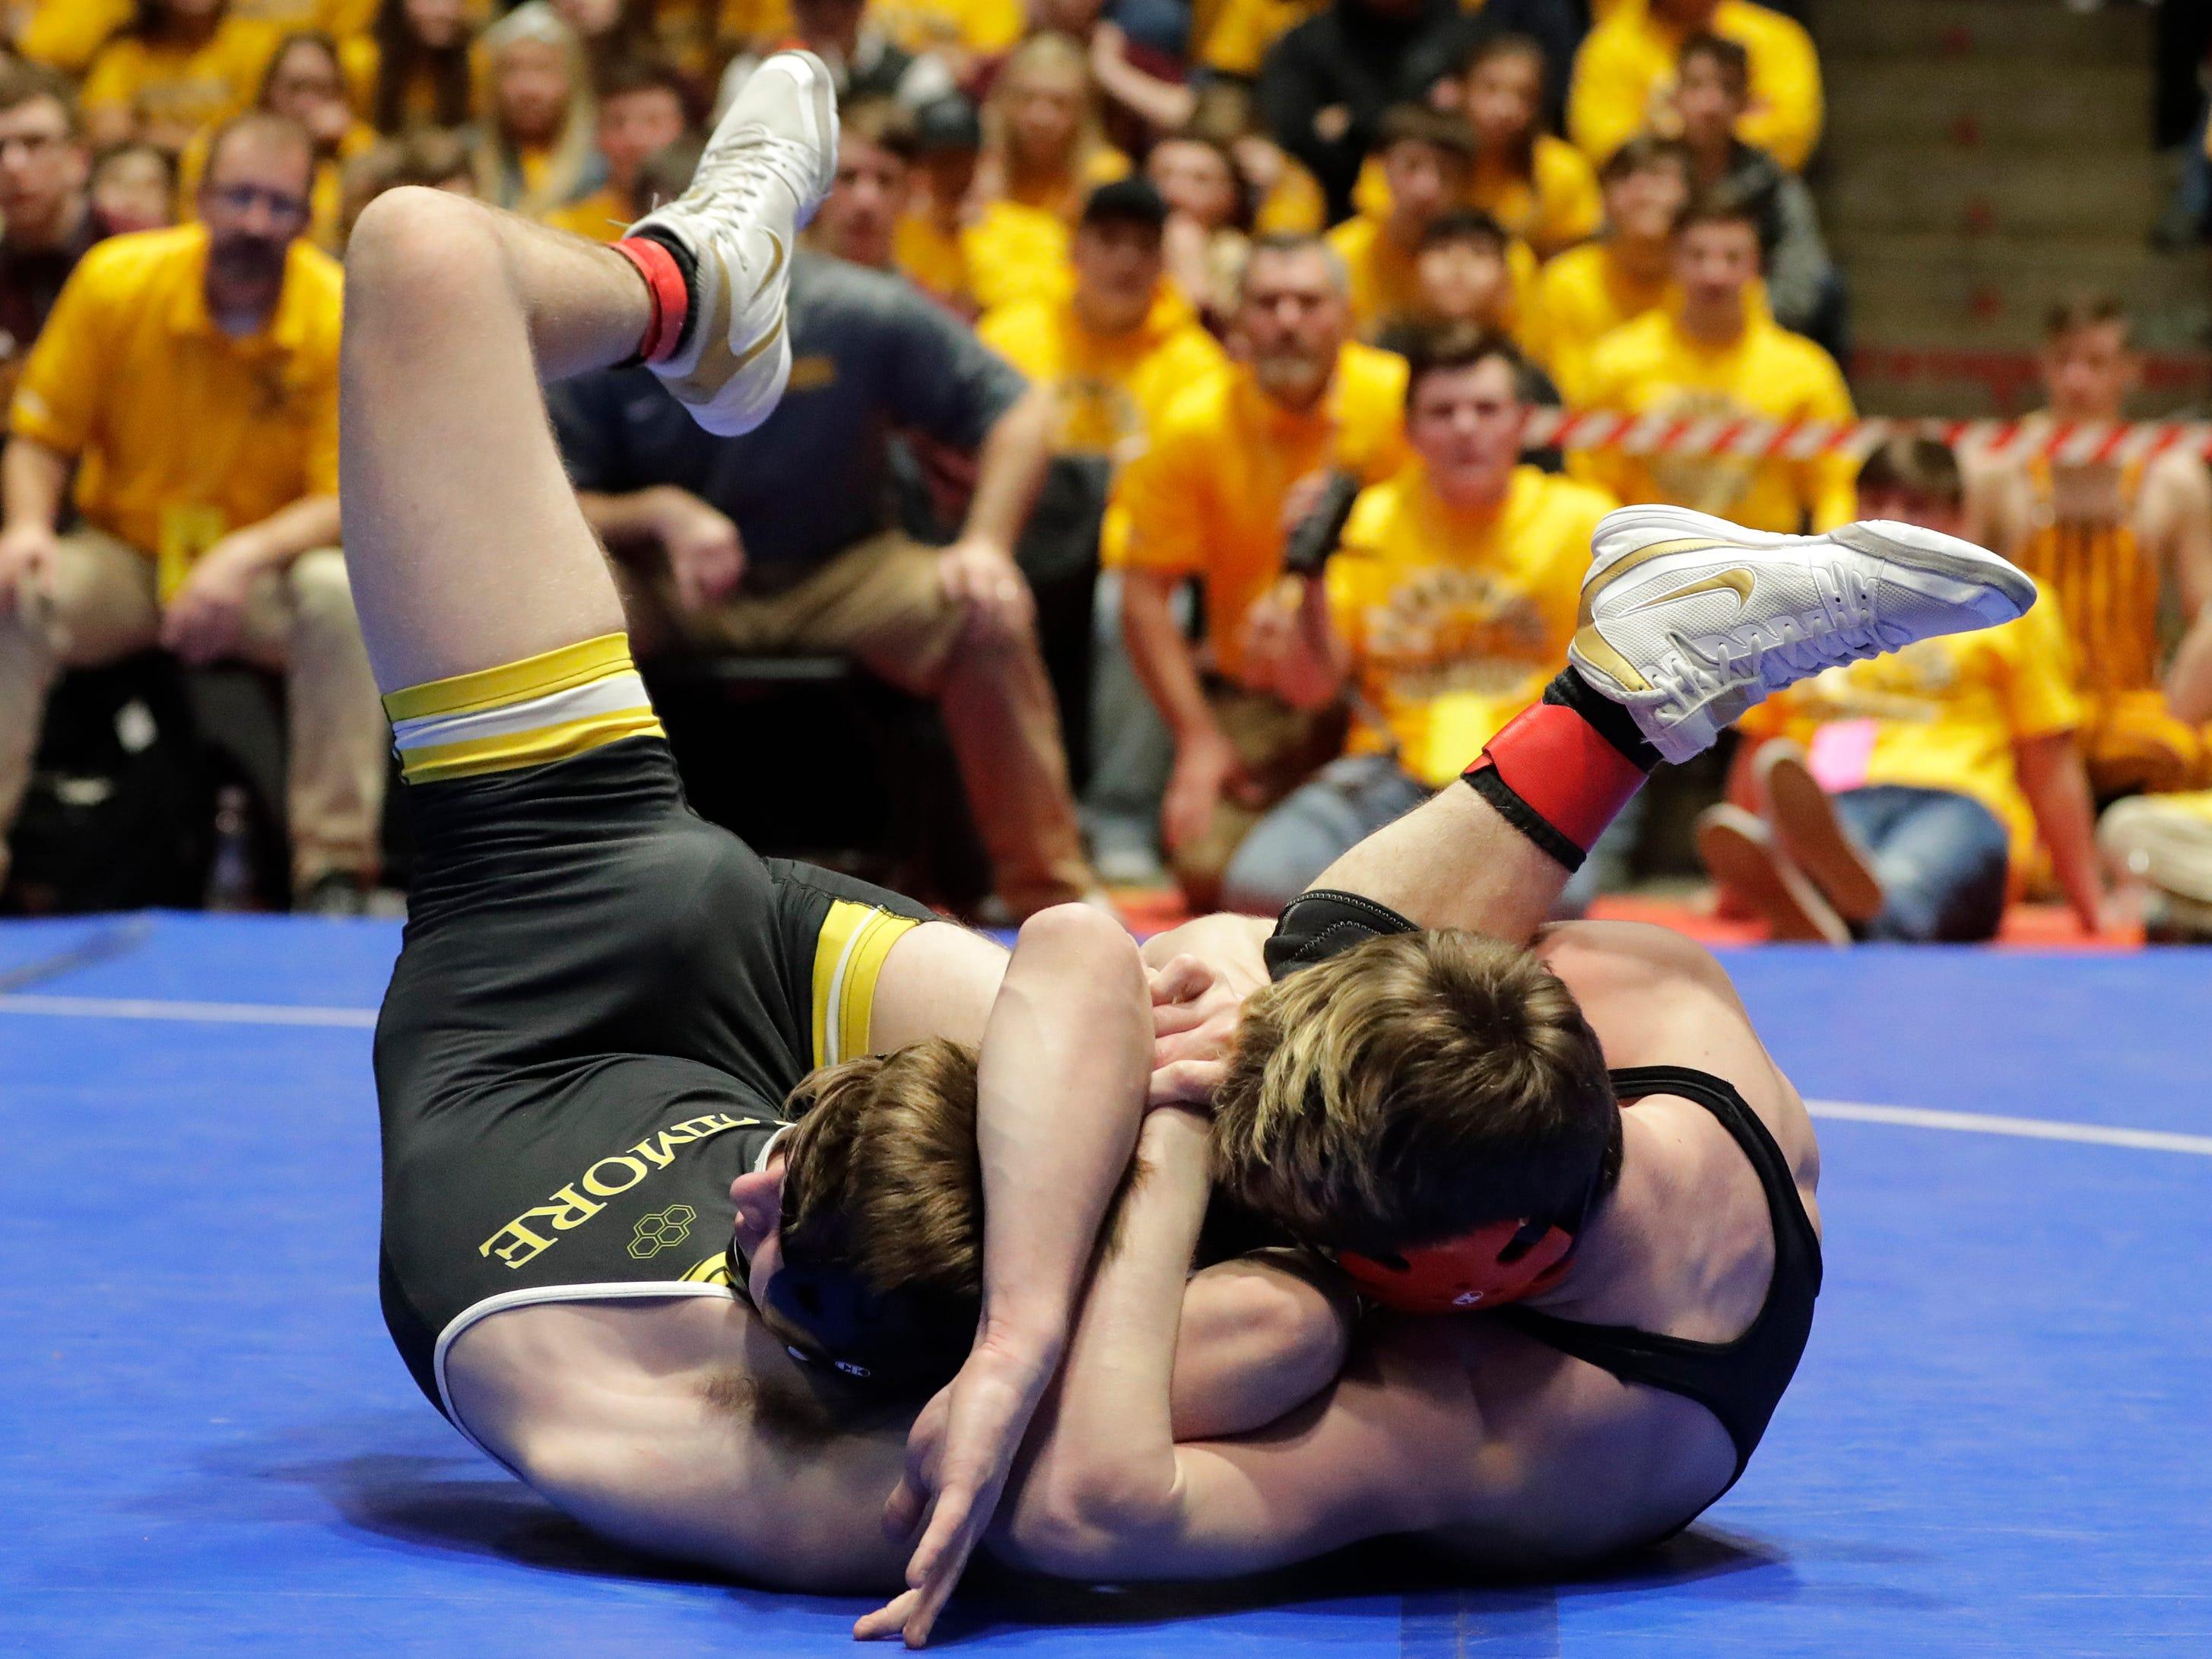 Stratford's Devin Dennee, right, wrestles Fennimore's Nick Blaschke in the 152-pound class, Saturday, March 2, 2019, in Madison, Wis.